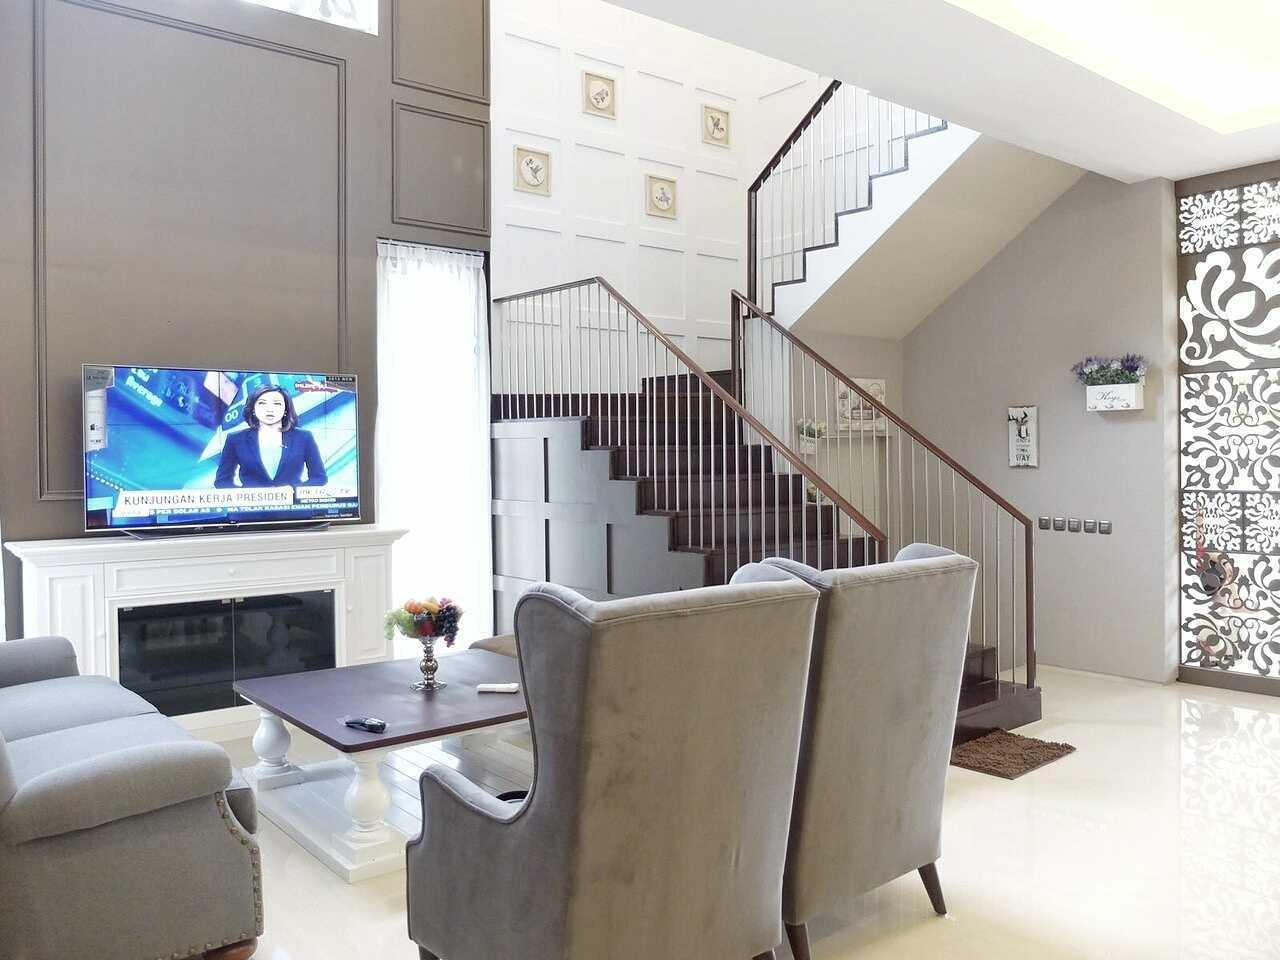 7Design Architect Mrs. D House Citrasun, Yogjakarta Citrasun, Yogjakarta Livingroom Klasik 18696